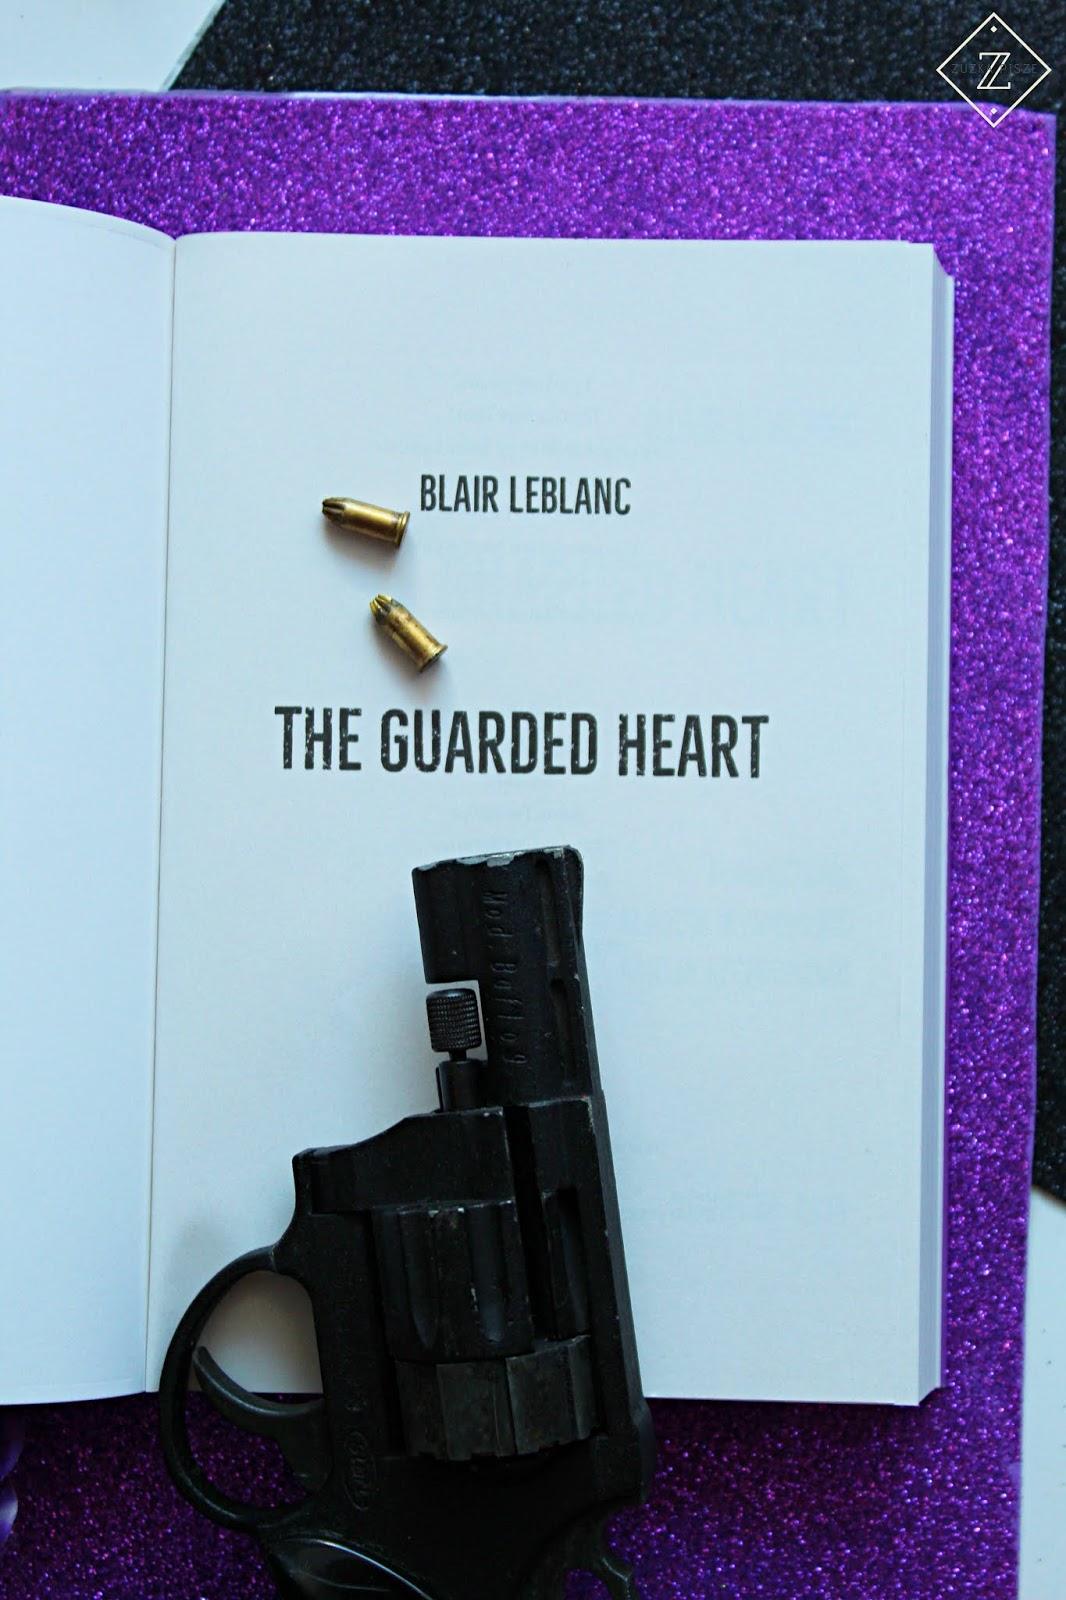 "Blair LeBlanc ""The Guarded Heart"" - recenzja patronacka"